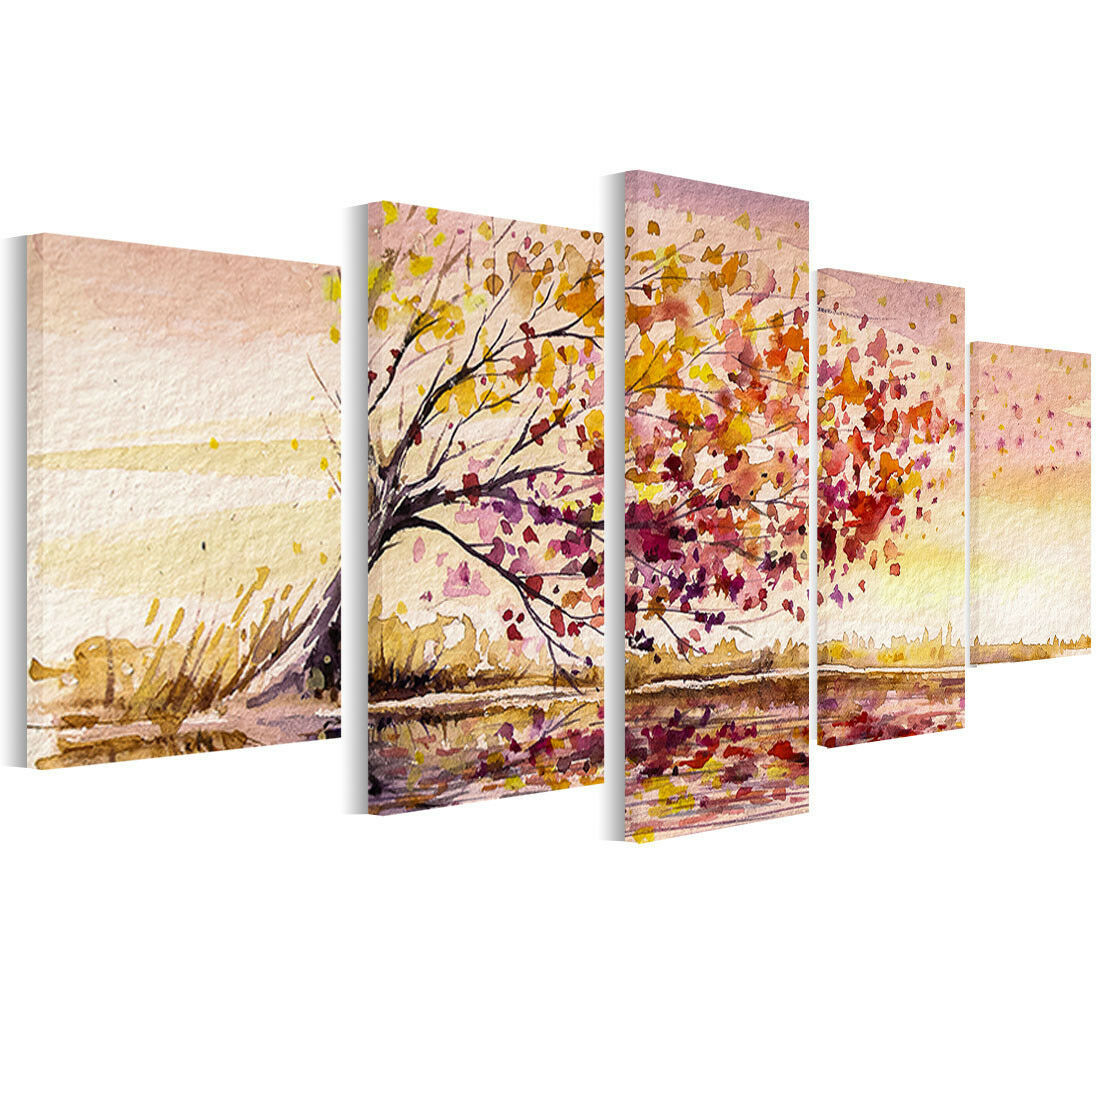 Leinwand Bilder Baum auf dem Wind - Foto, Bild, Wandbilder Landschaft B5D20